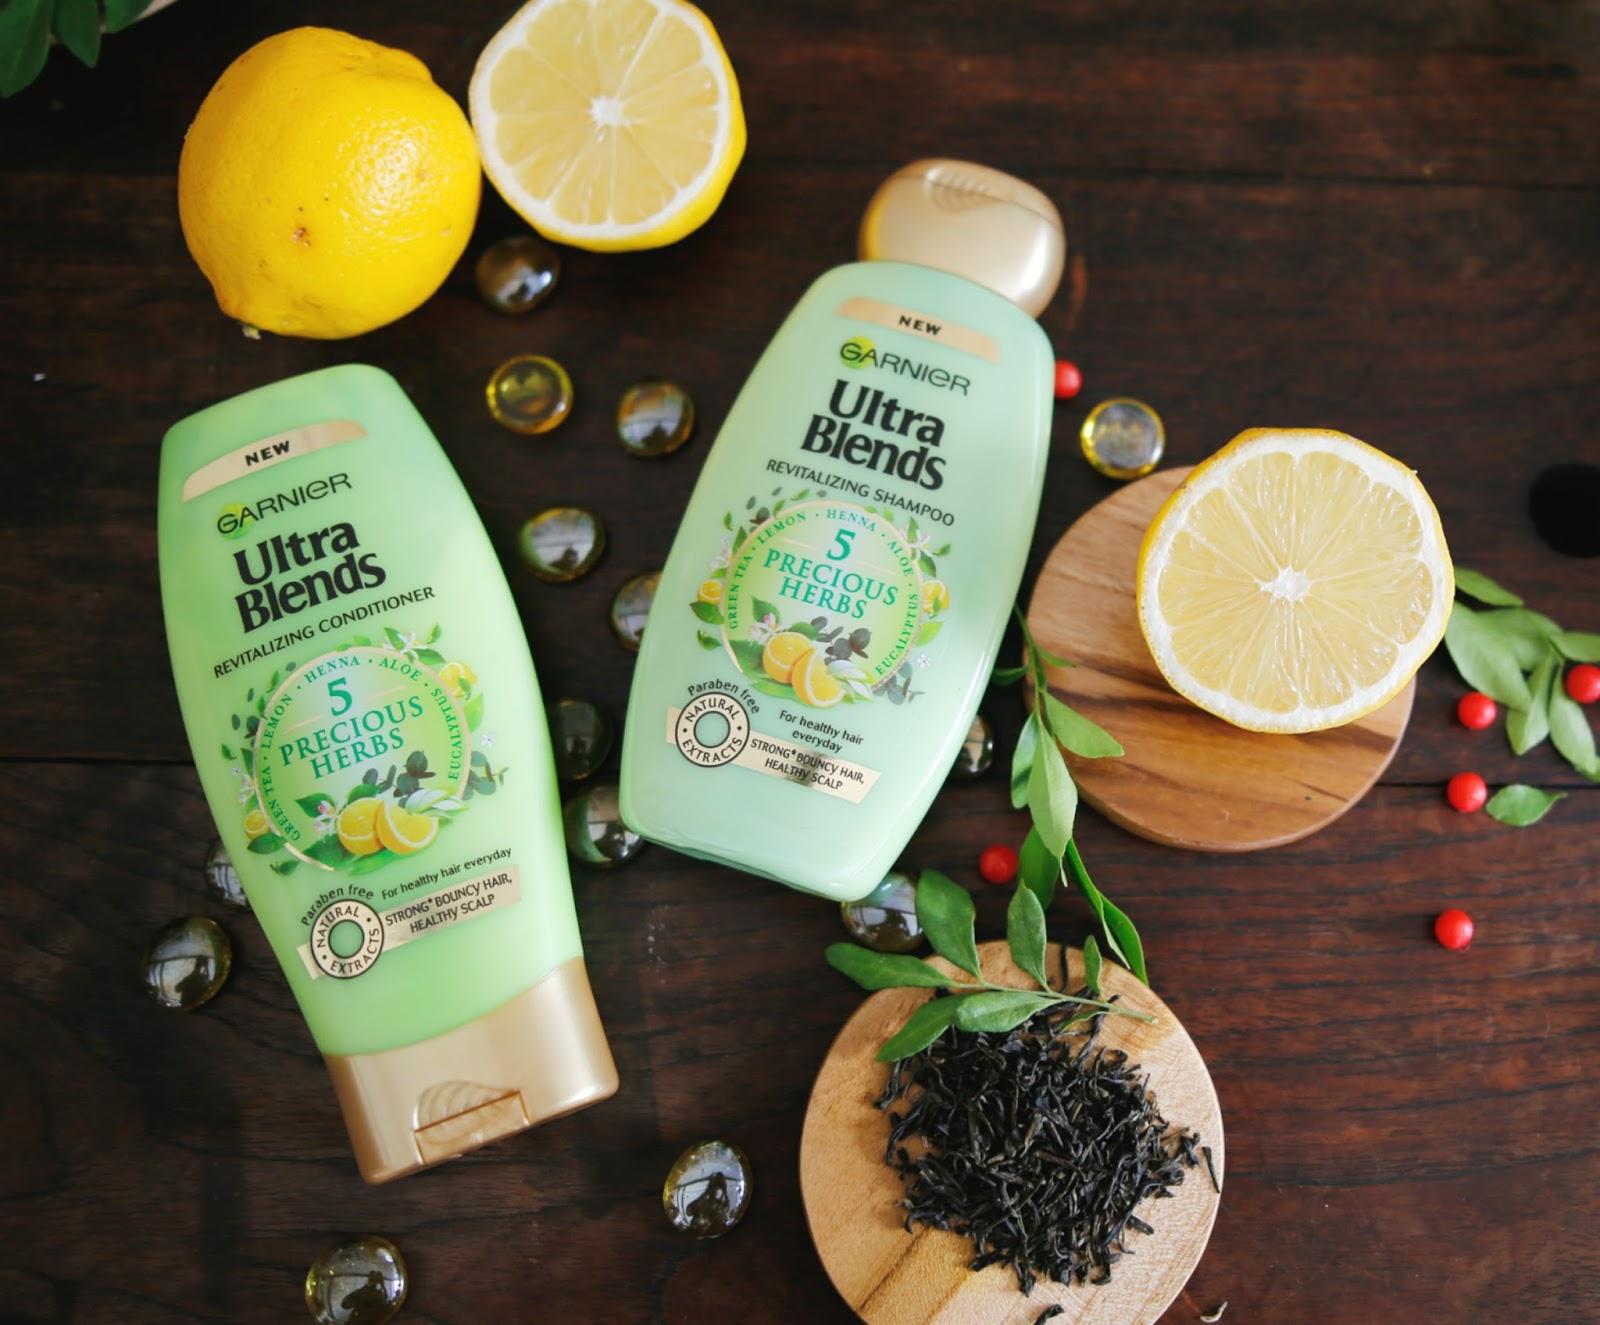 Garnier Ultra Blends 5 precious herbs Shampoo Review